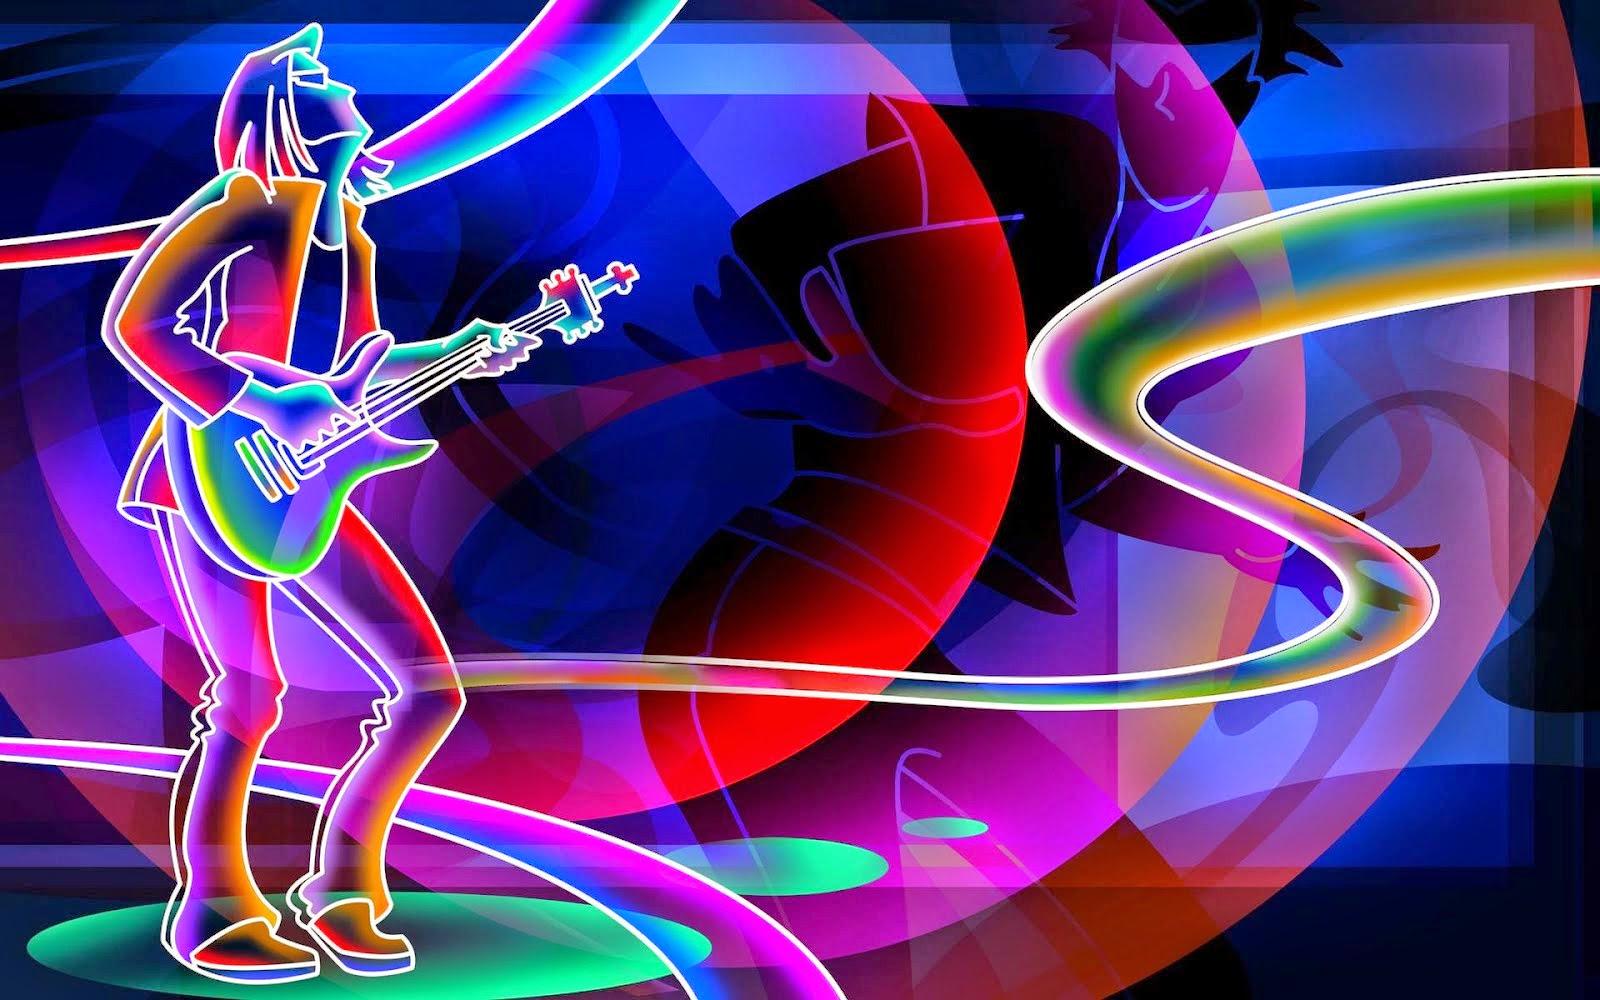 CONCIERTOS MUSIC: Pink Floyd: The Dark Side Live